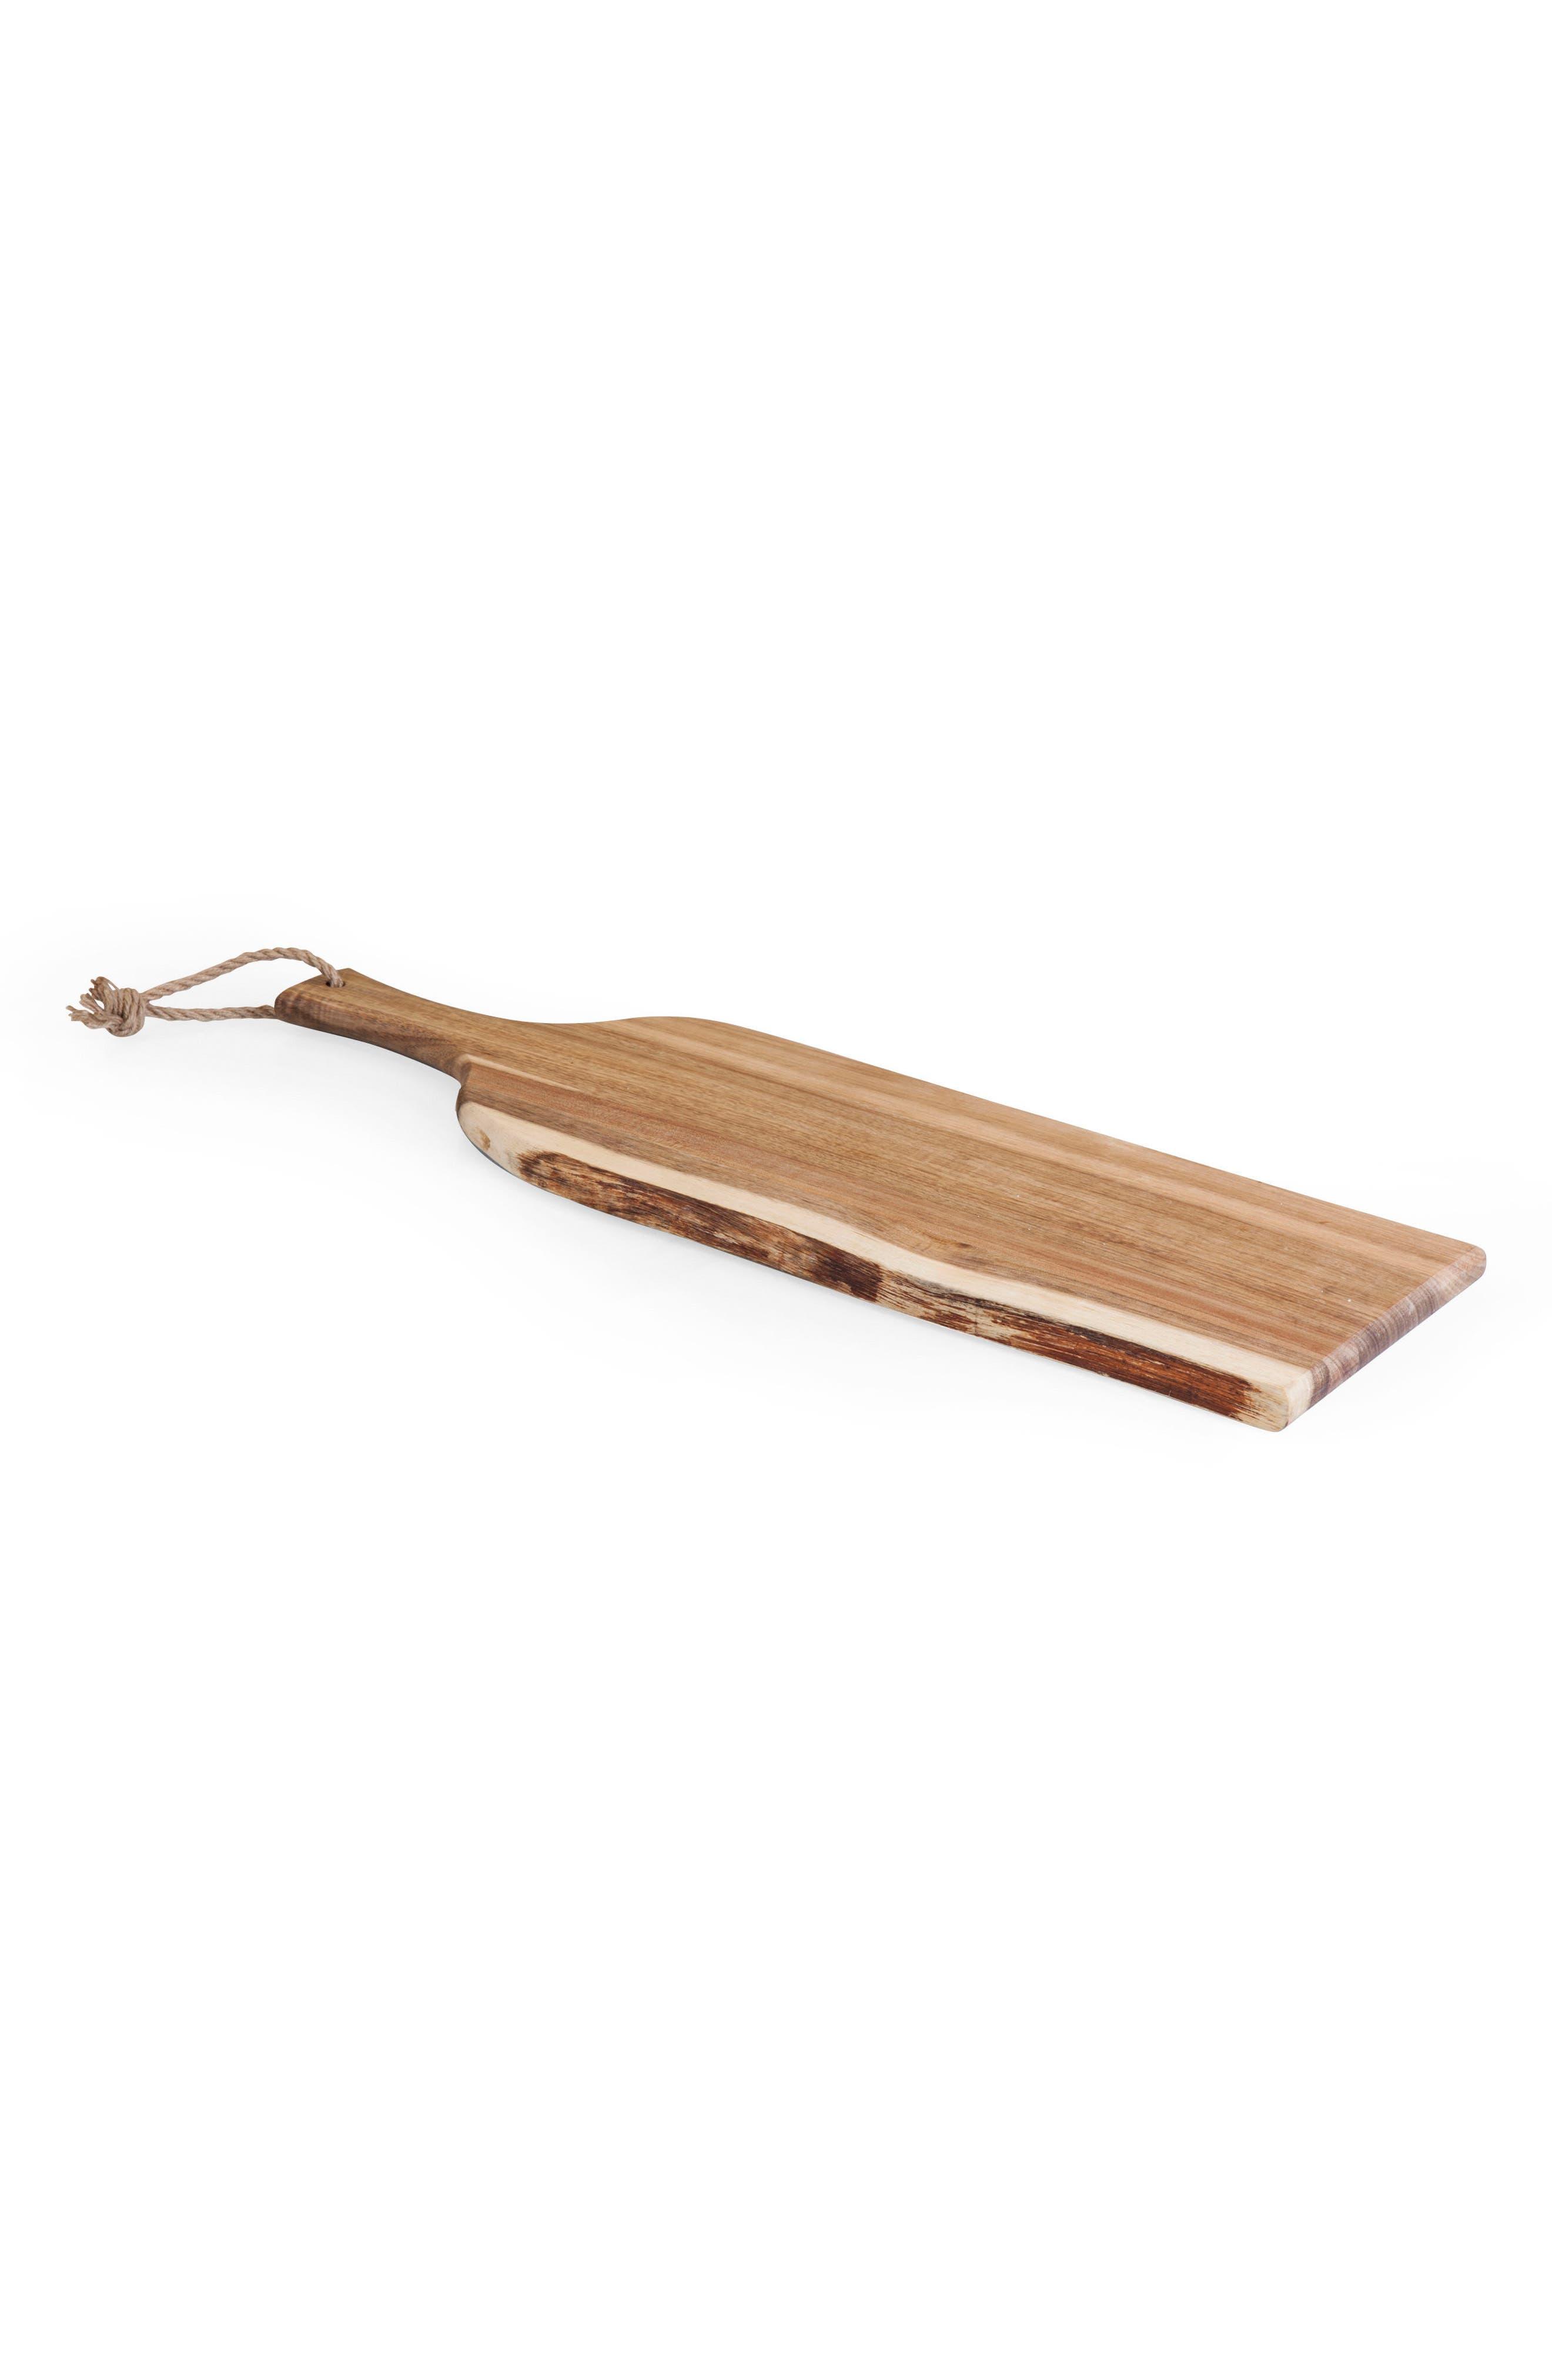 Main Image - Picnic Time Artisan Acacia Serving Plank